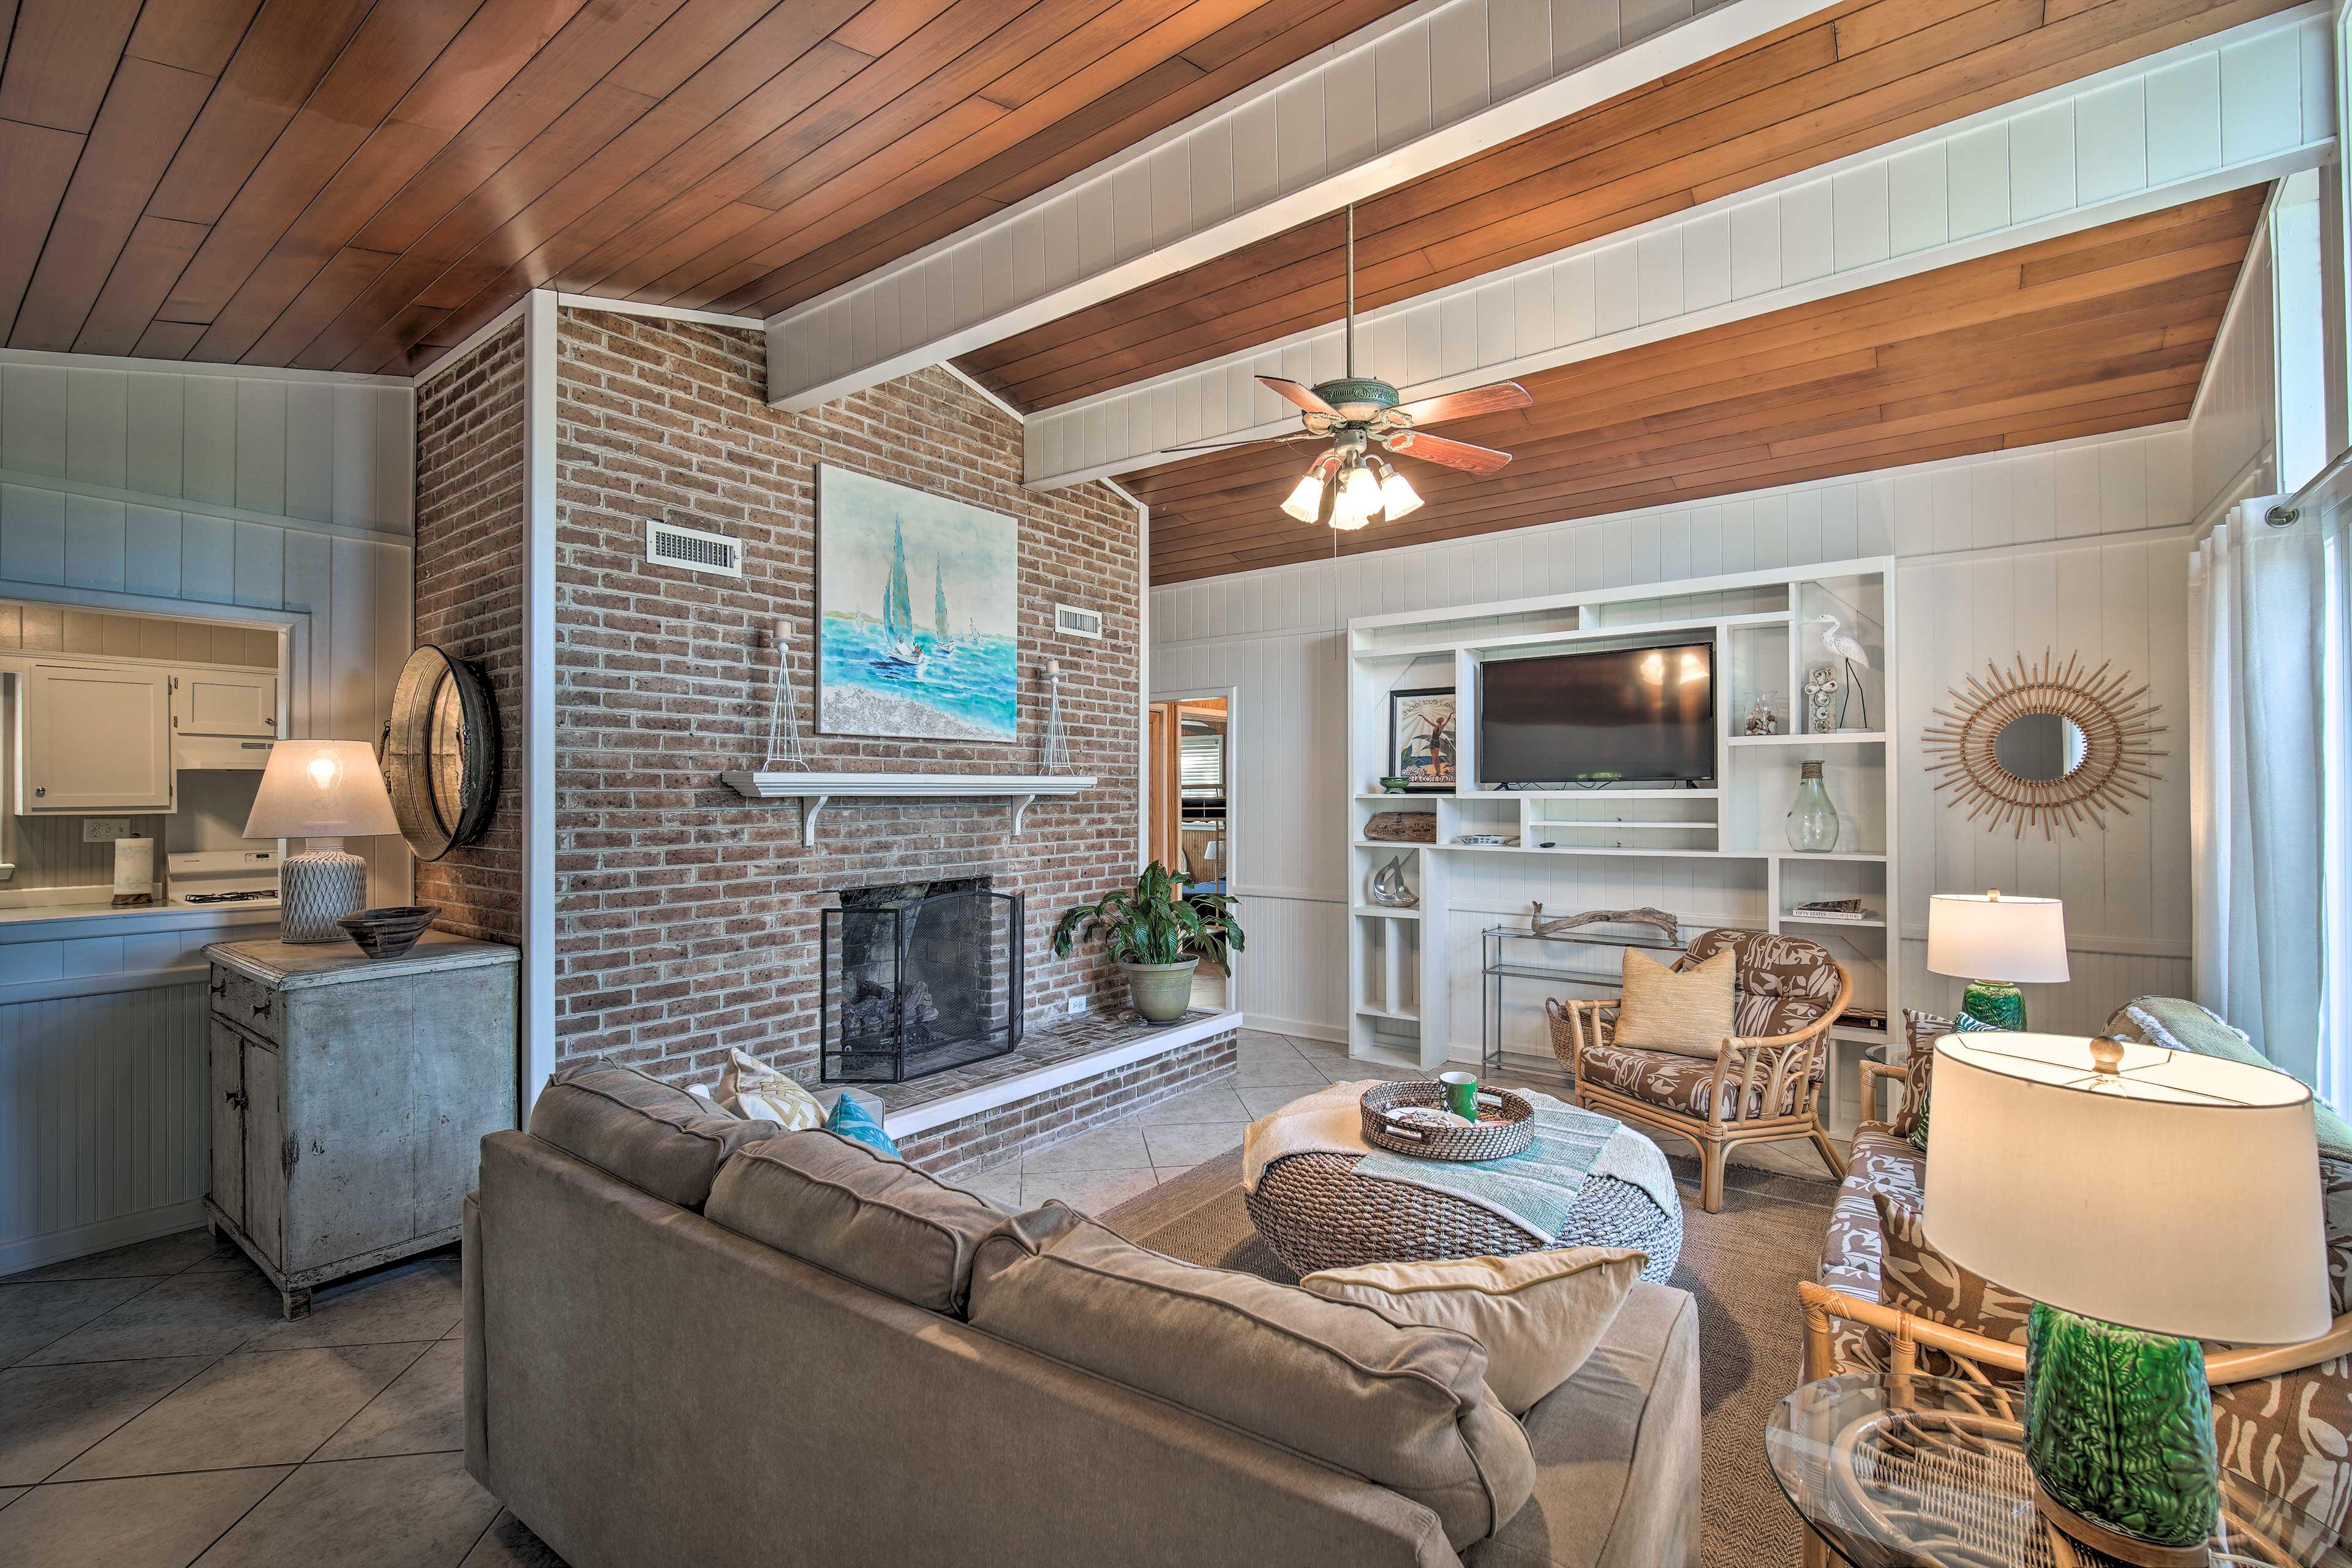 Elberta Vacation Rental   2BR   1BA   1,044 Sq Ft   Single-Story Home